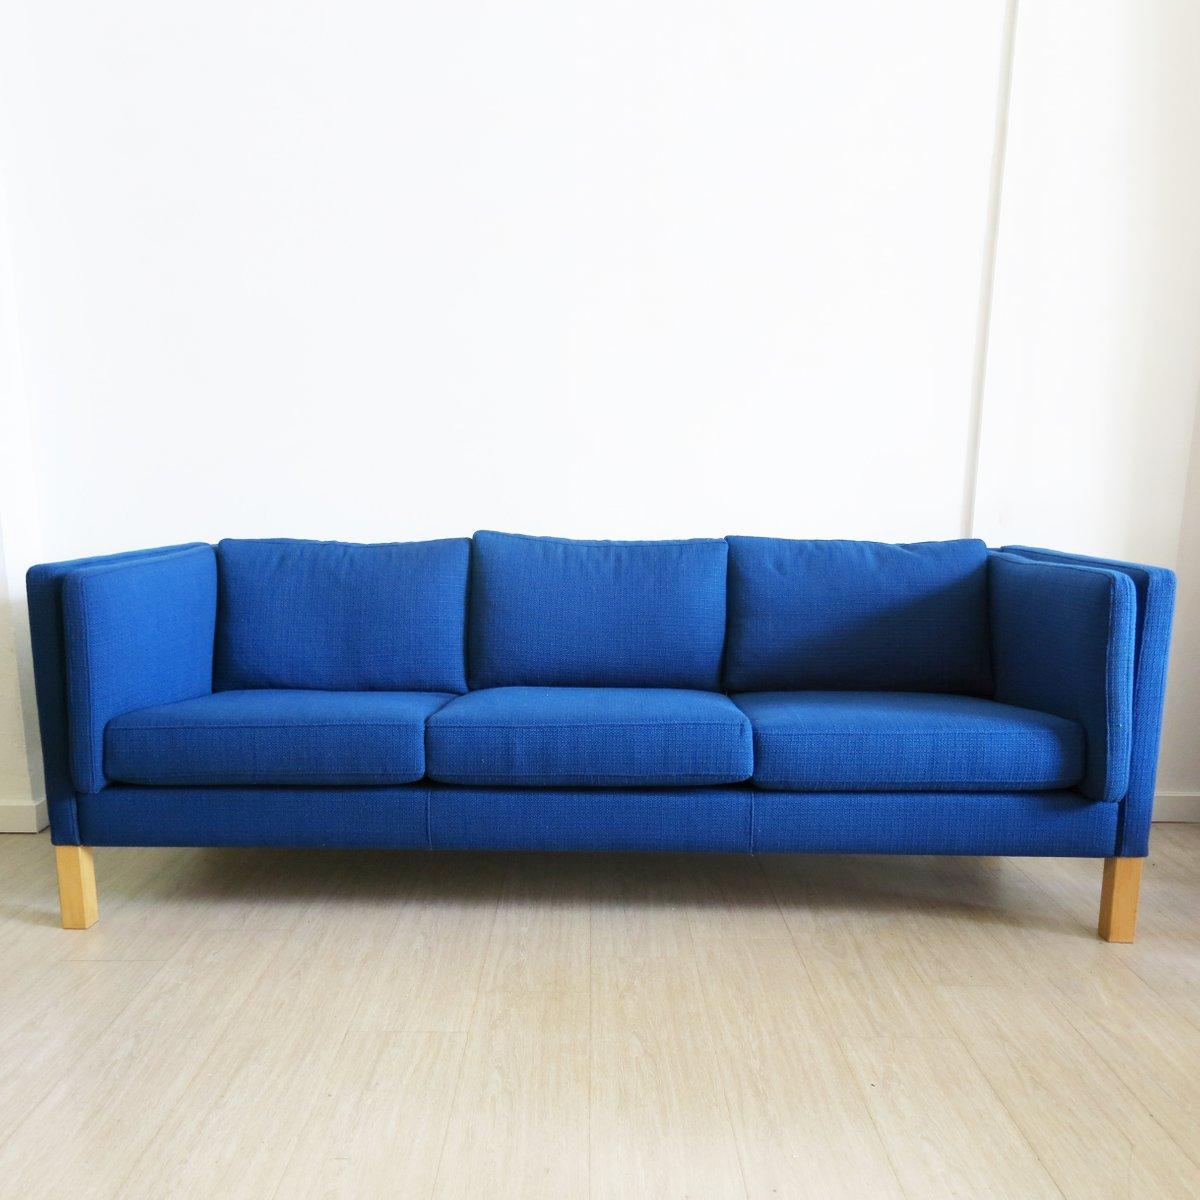 Danish Sofa By Soren Lund 1970s For Sale At Pamono